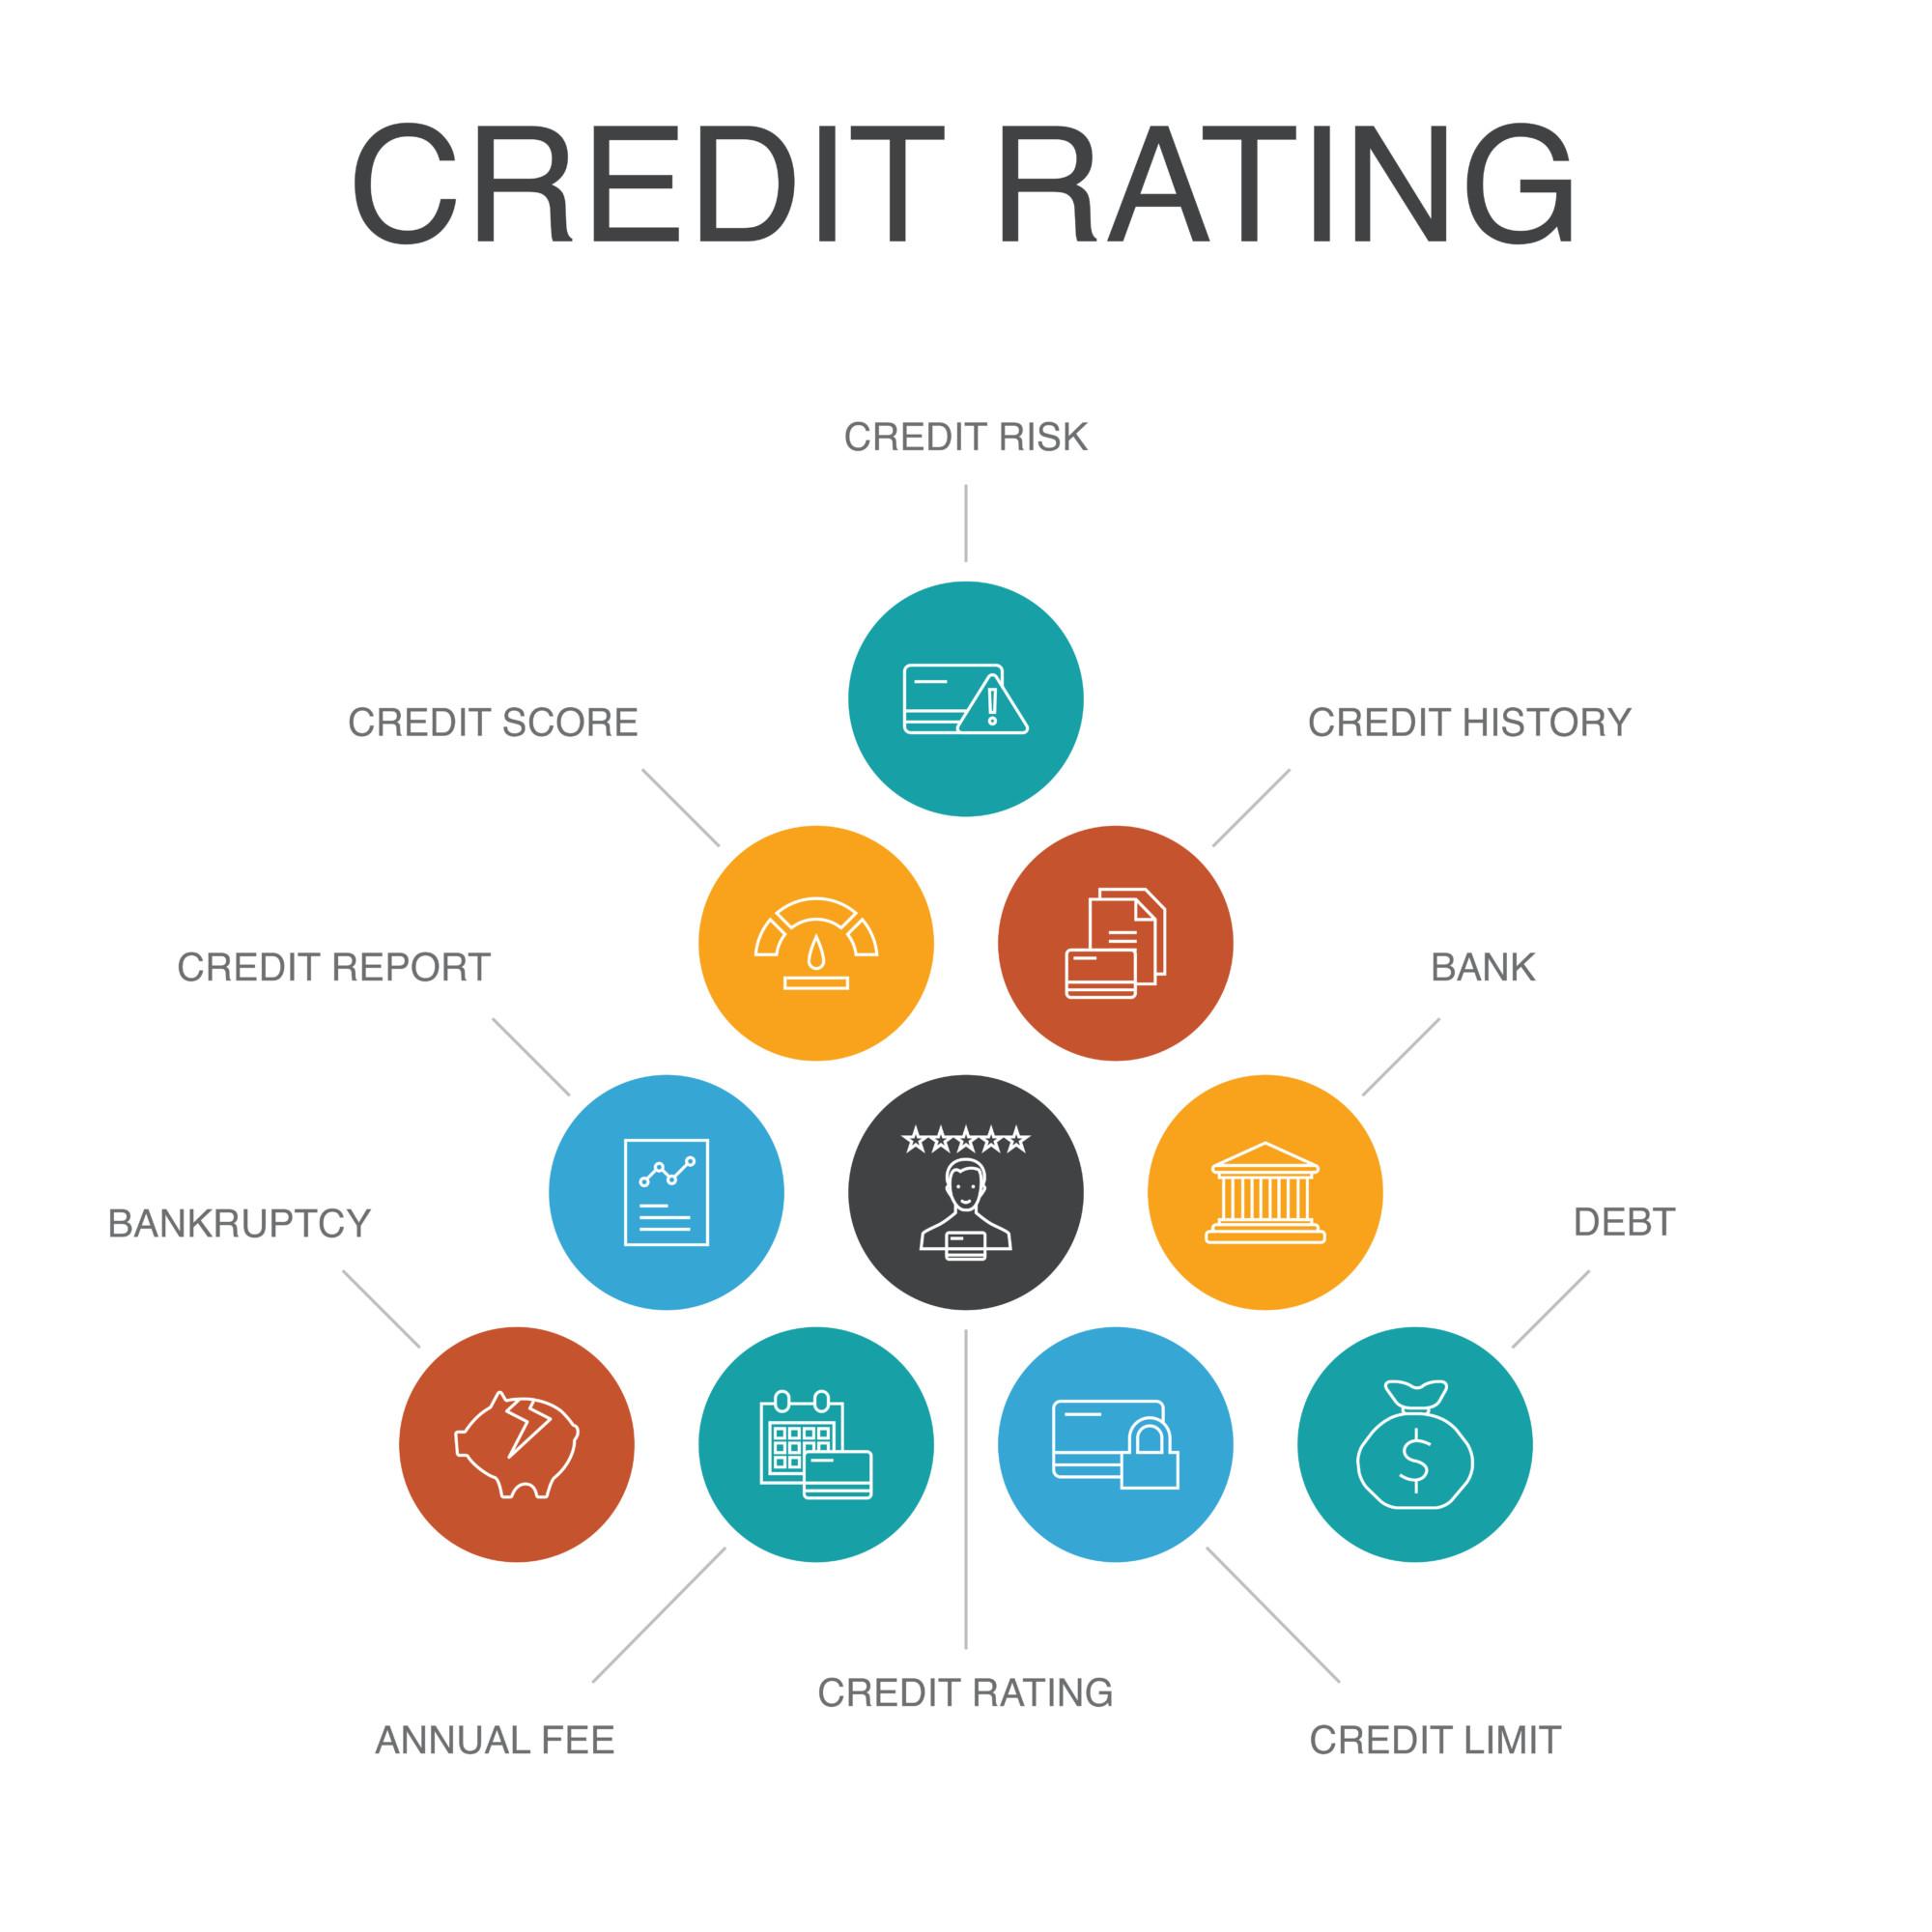 FICO Credit Rating Score